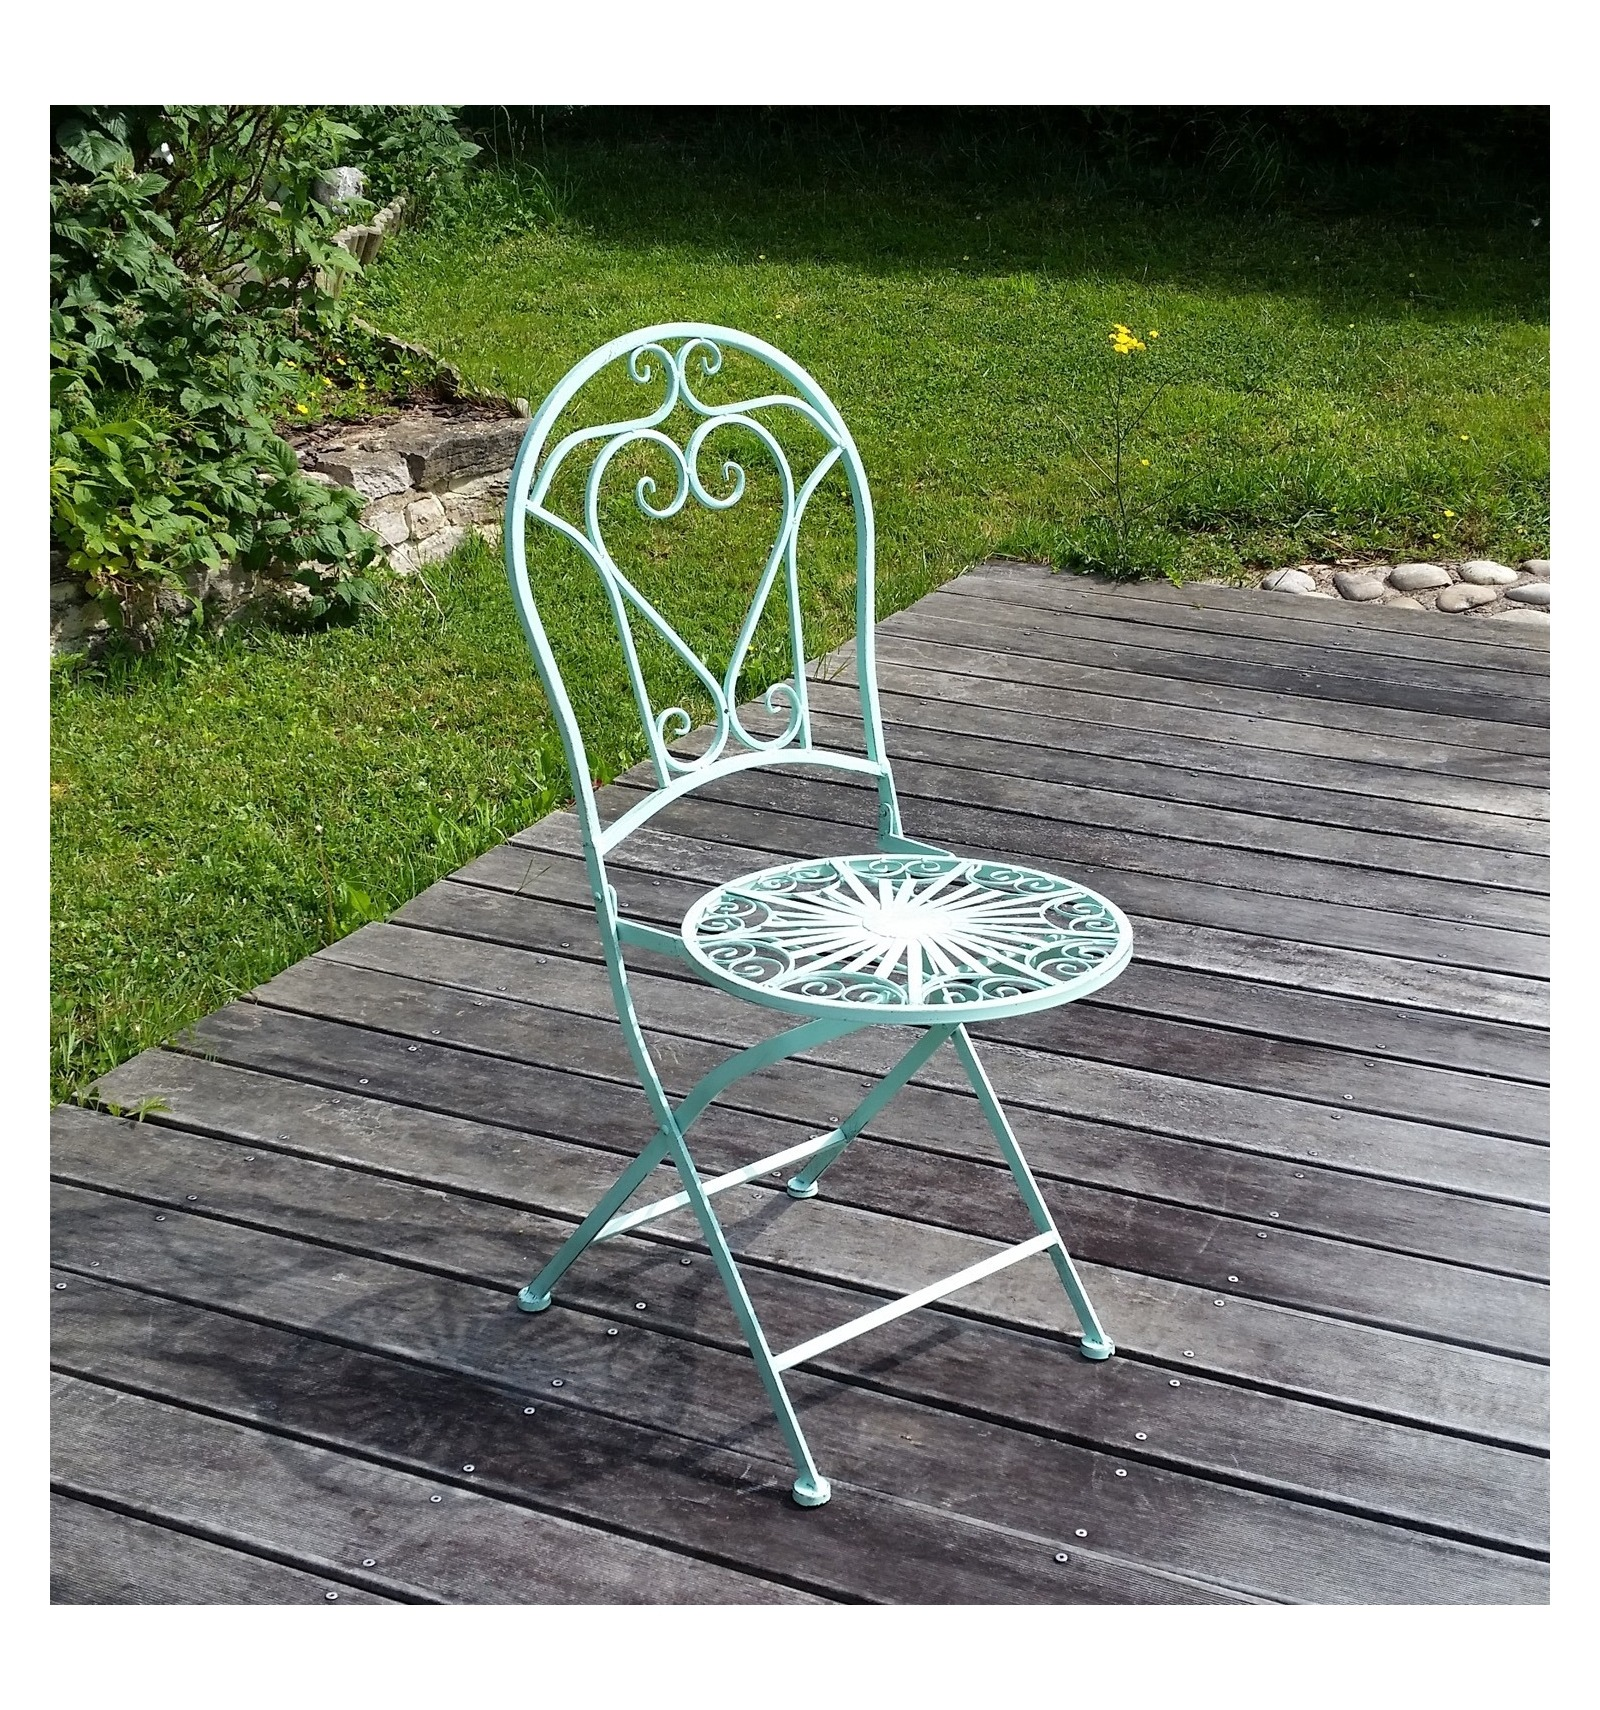 Muebles de jard n de hierro forjado for Muebles de jardin de hierro